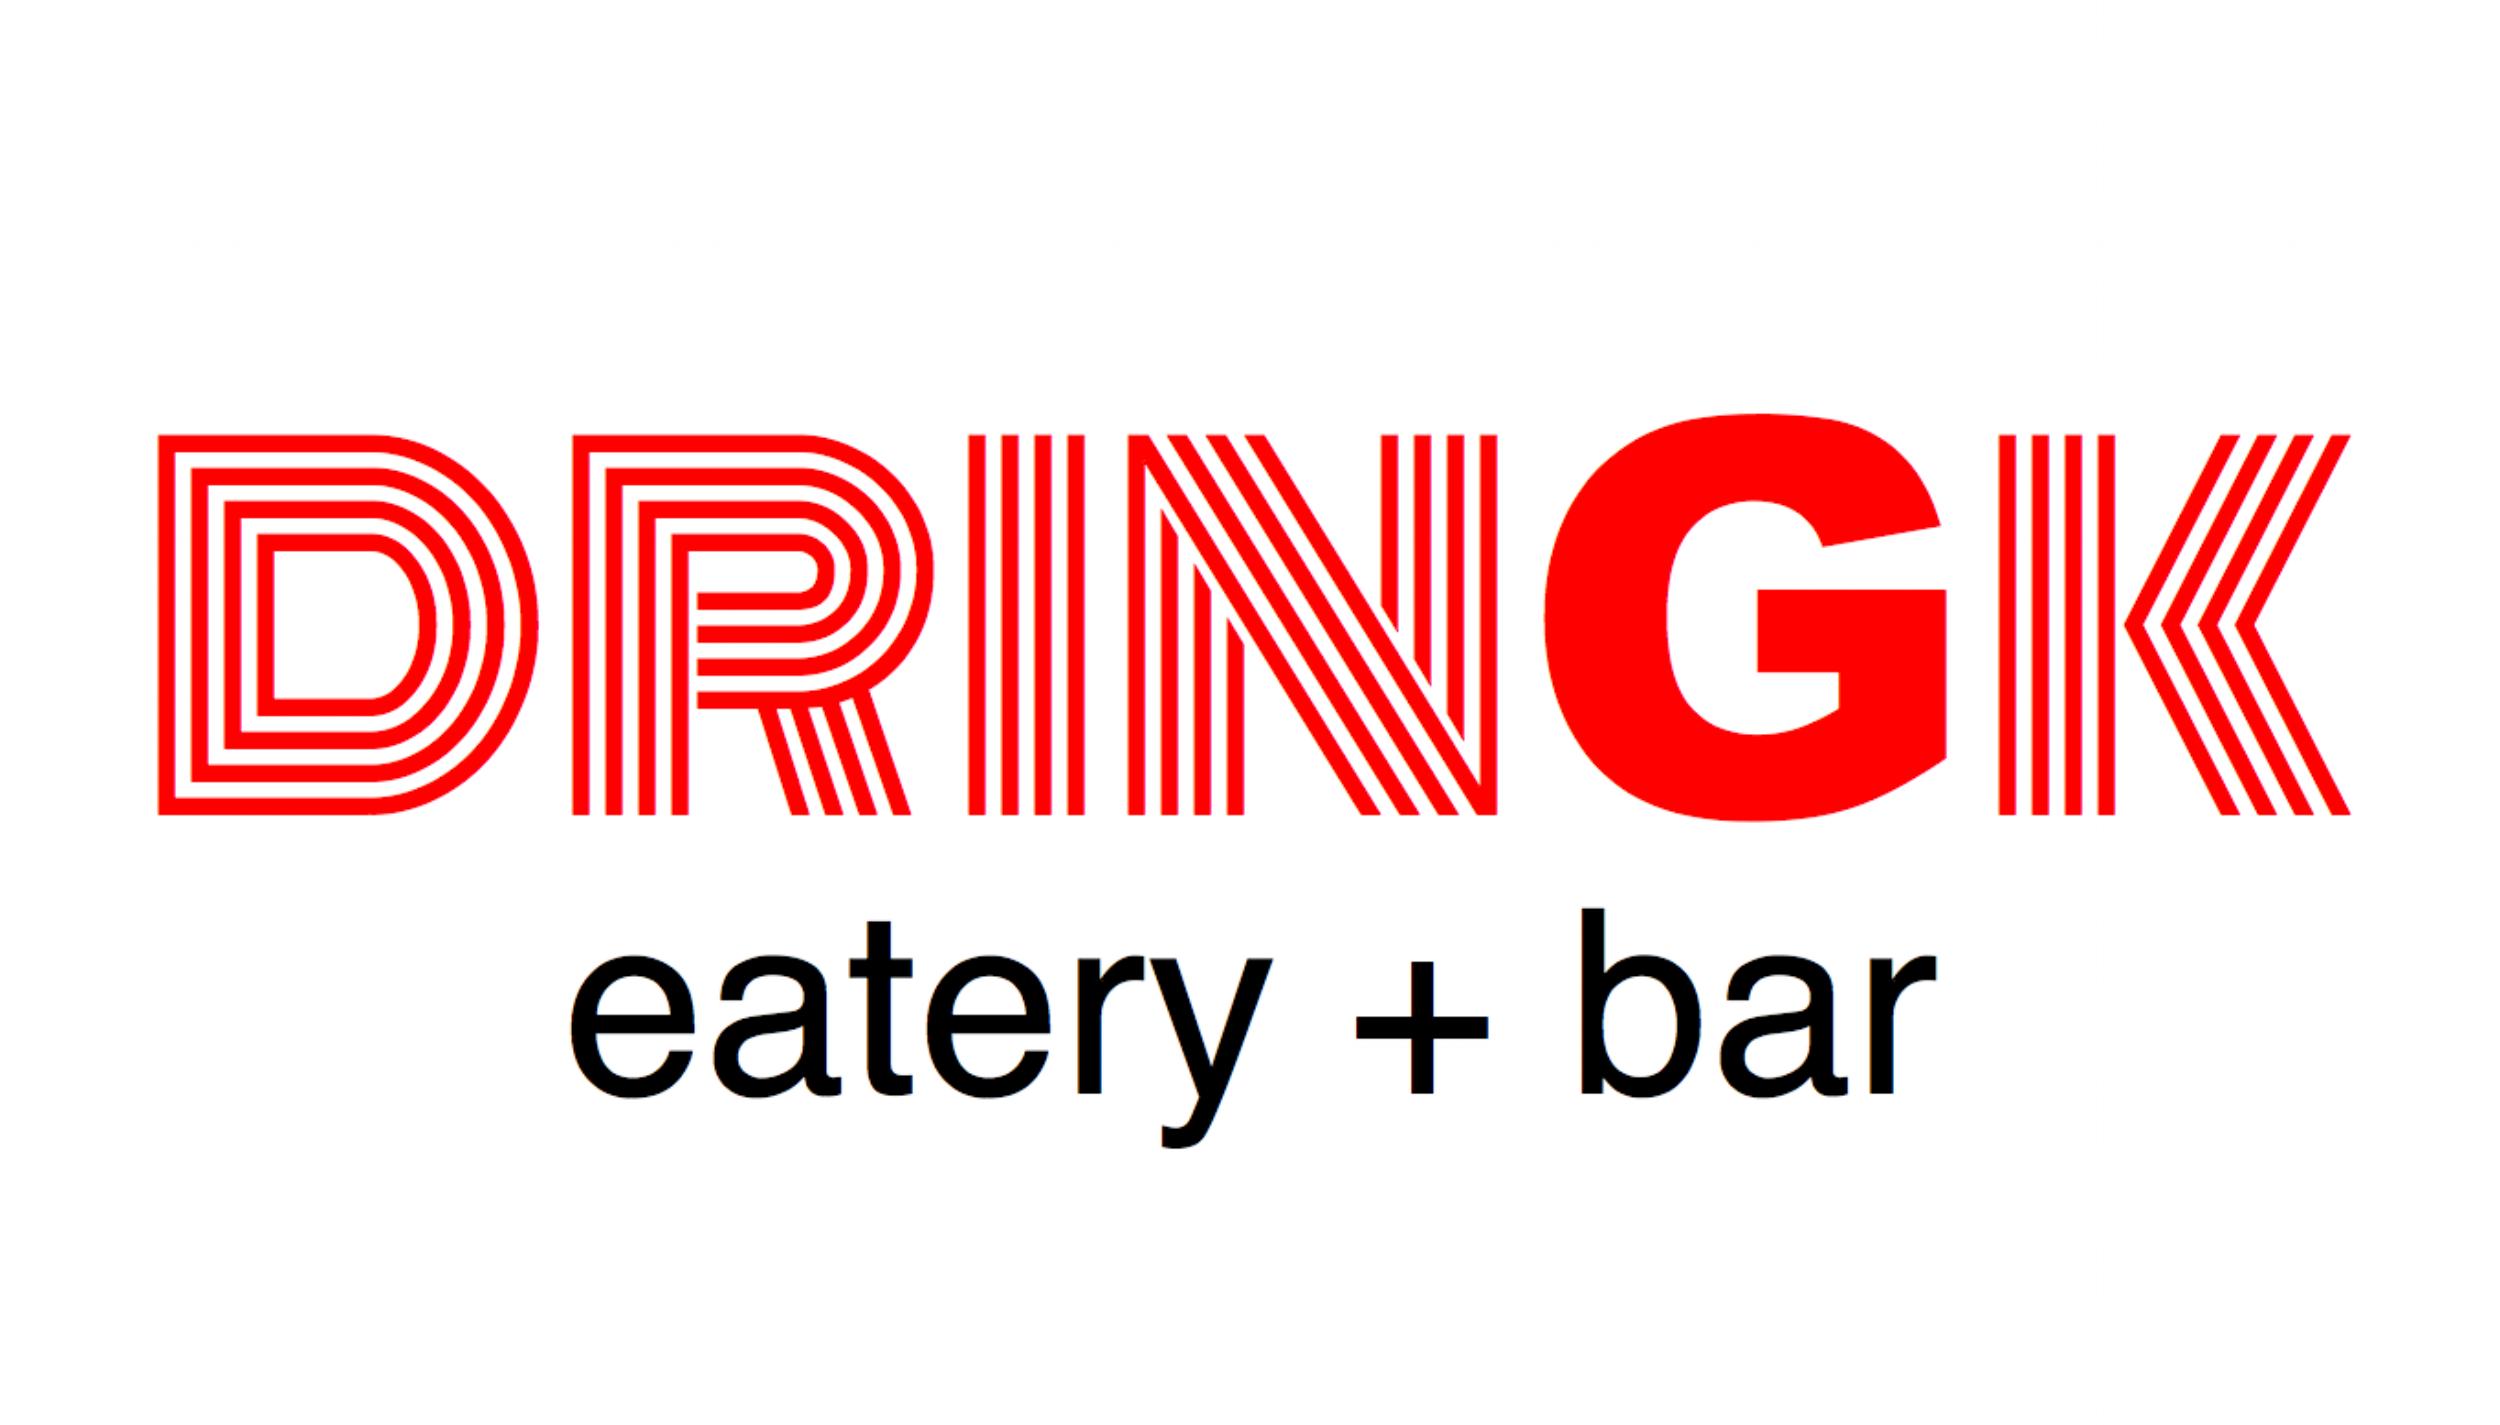 DRINGK LOGO.png